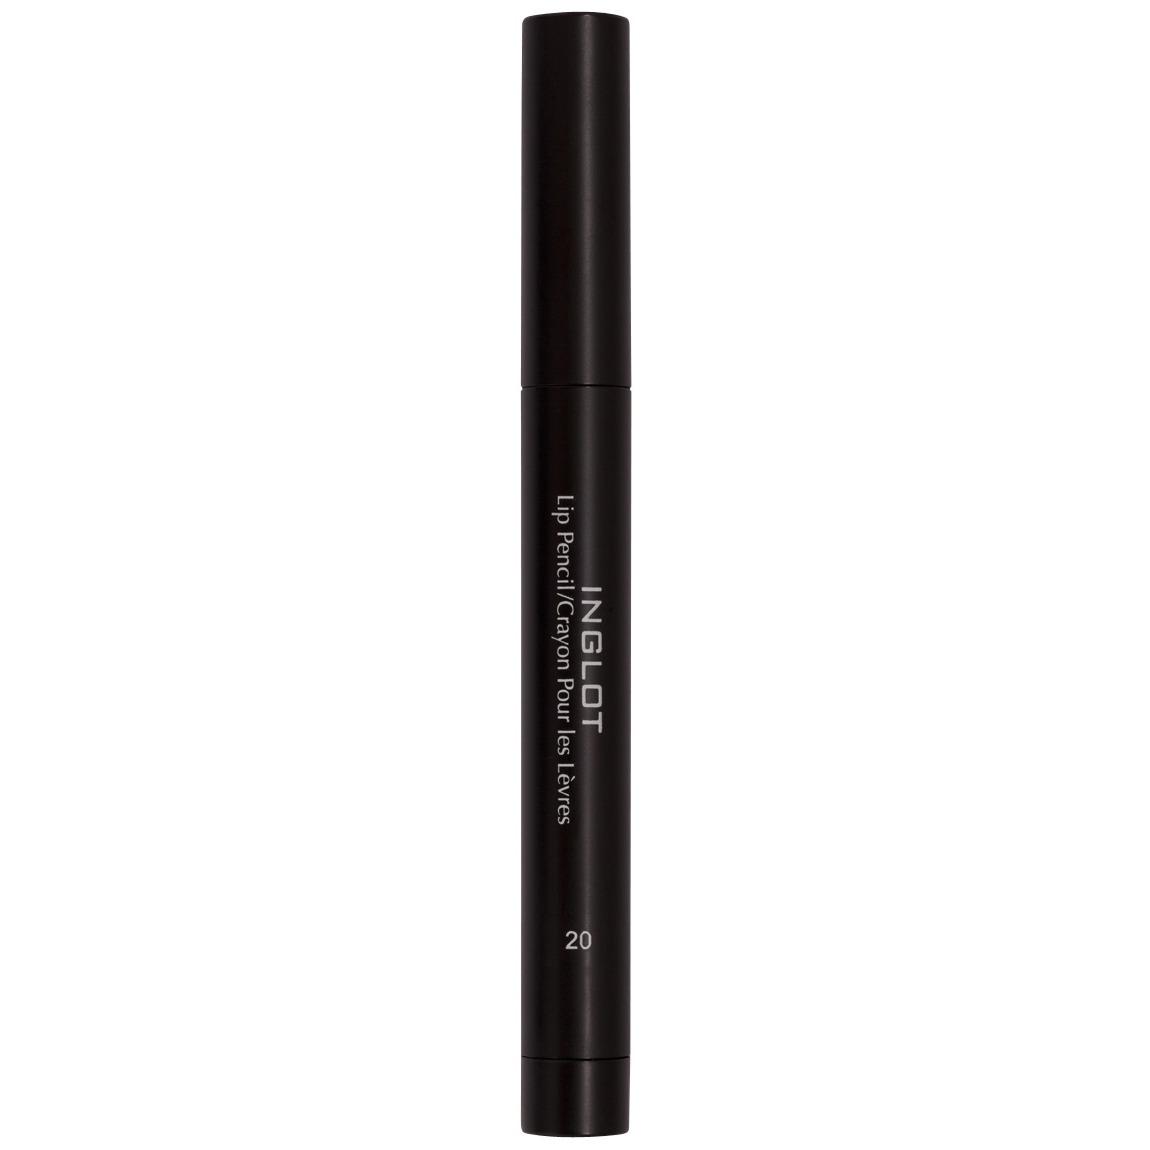 Inglot Cosmetics AMC Lip Pencil 20 Matte